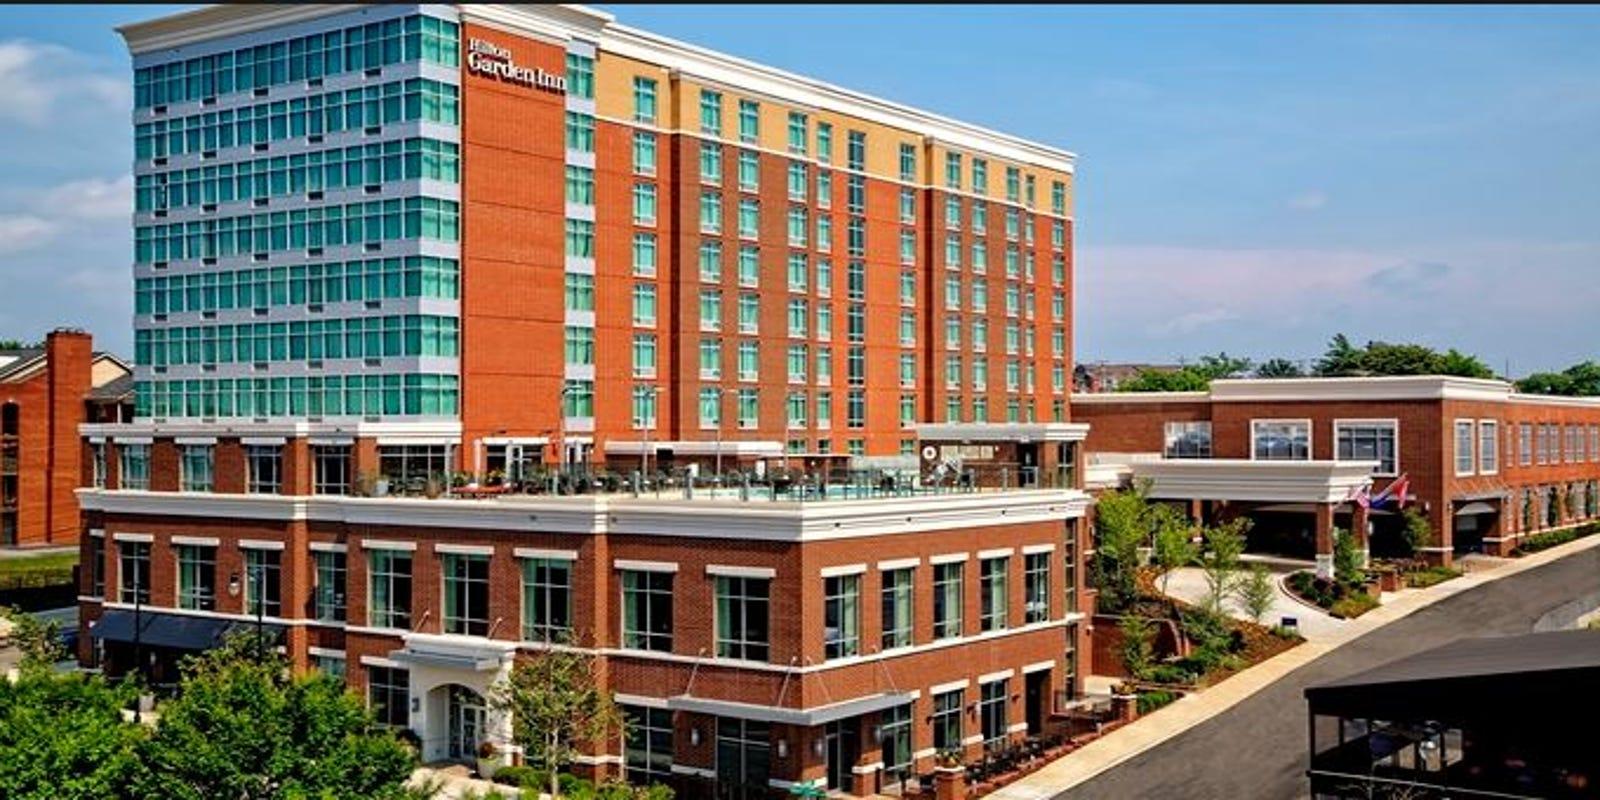 Ohio investor pays $80M for downtown Hilton Garden Inn